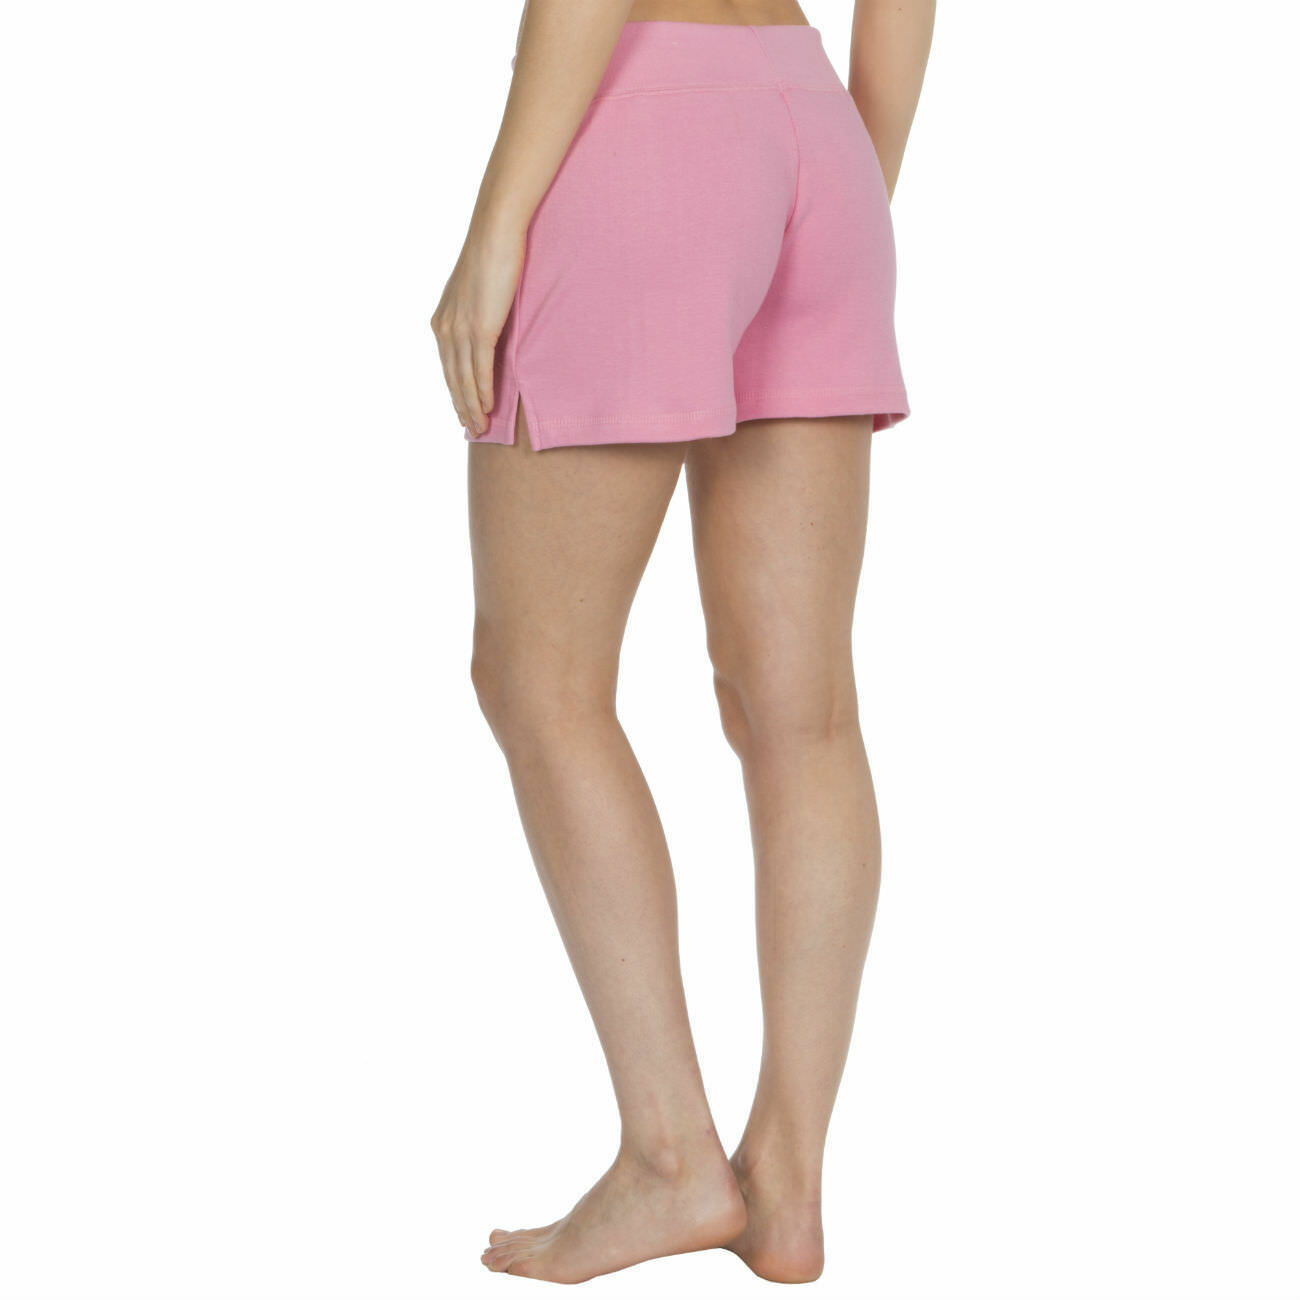 Womens-Cotton-Jersey-Shorts-Elastic-Waist-Summer-Beach-Casual-Yoga-Hot-Pants-New thumbnail 18